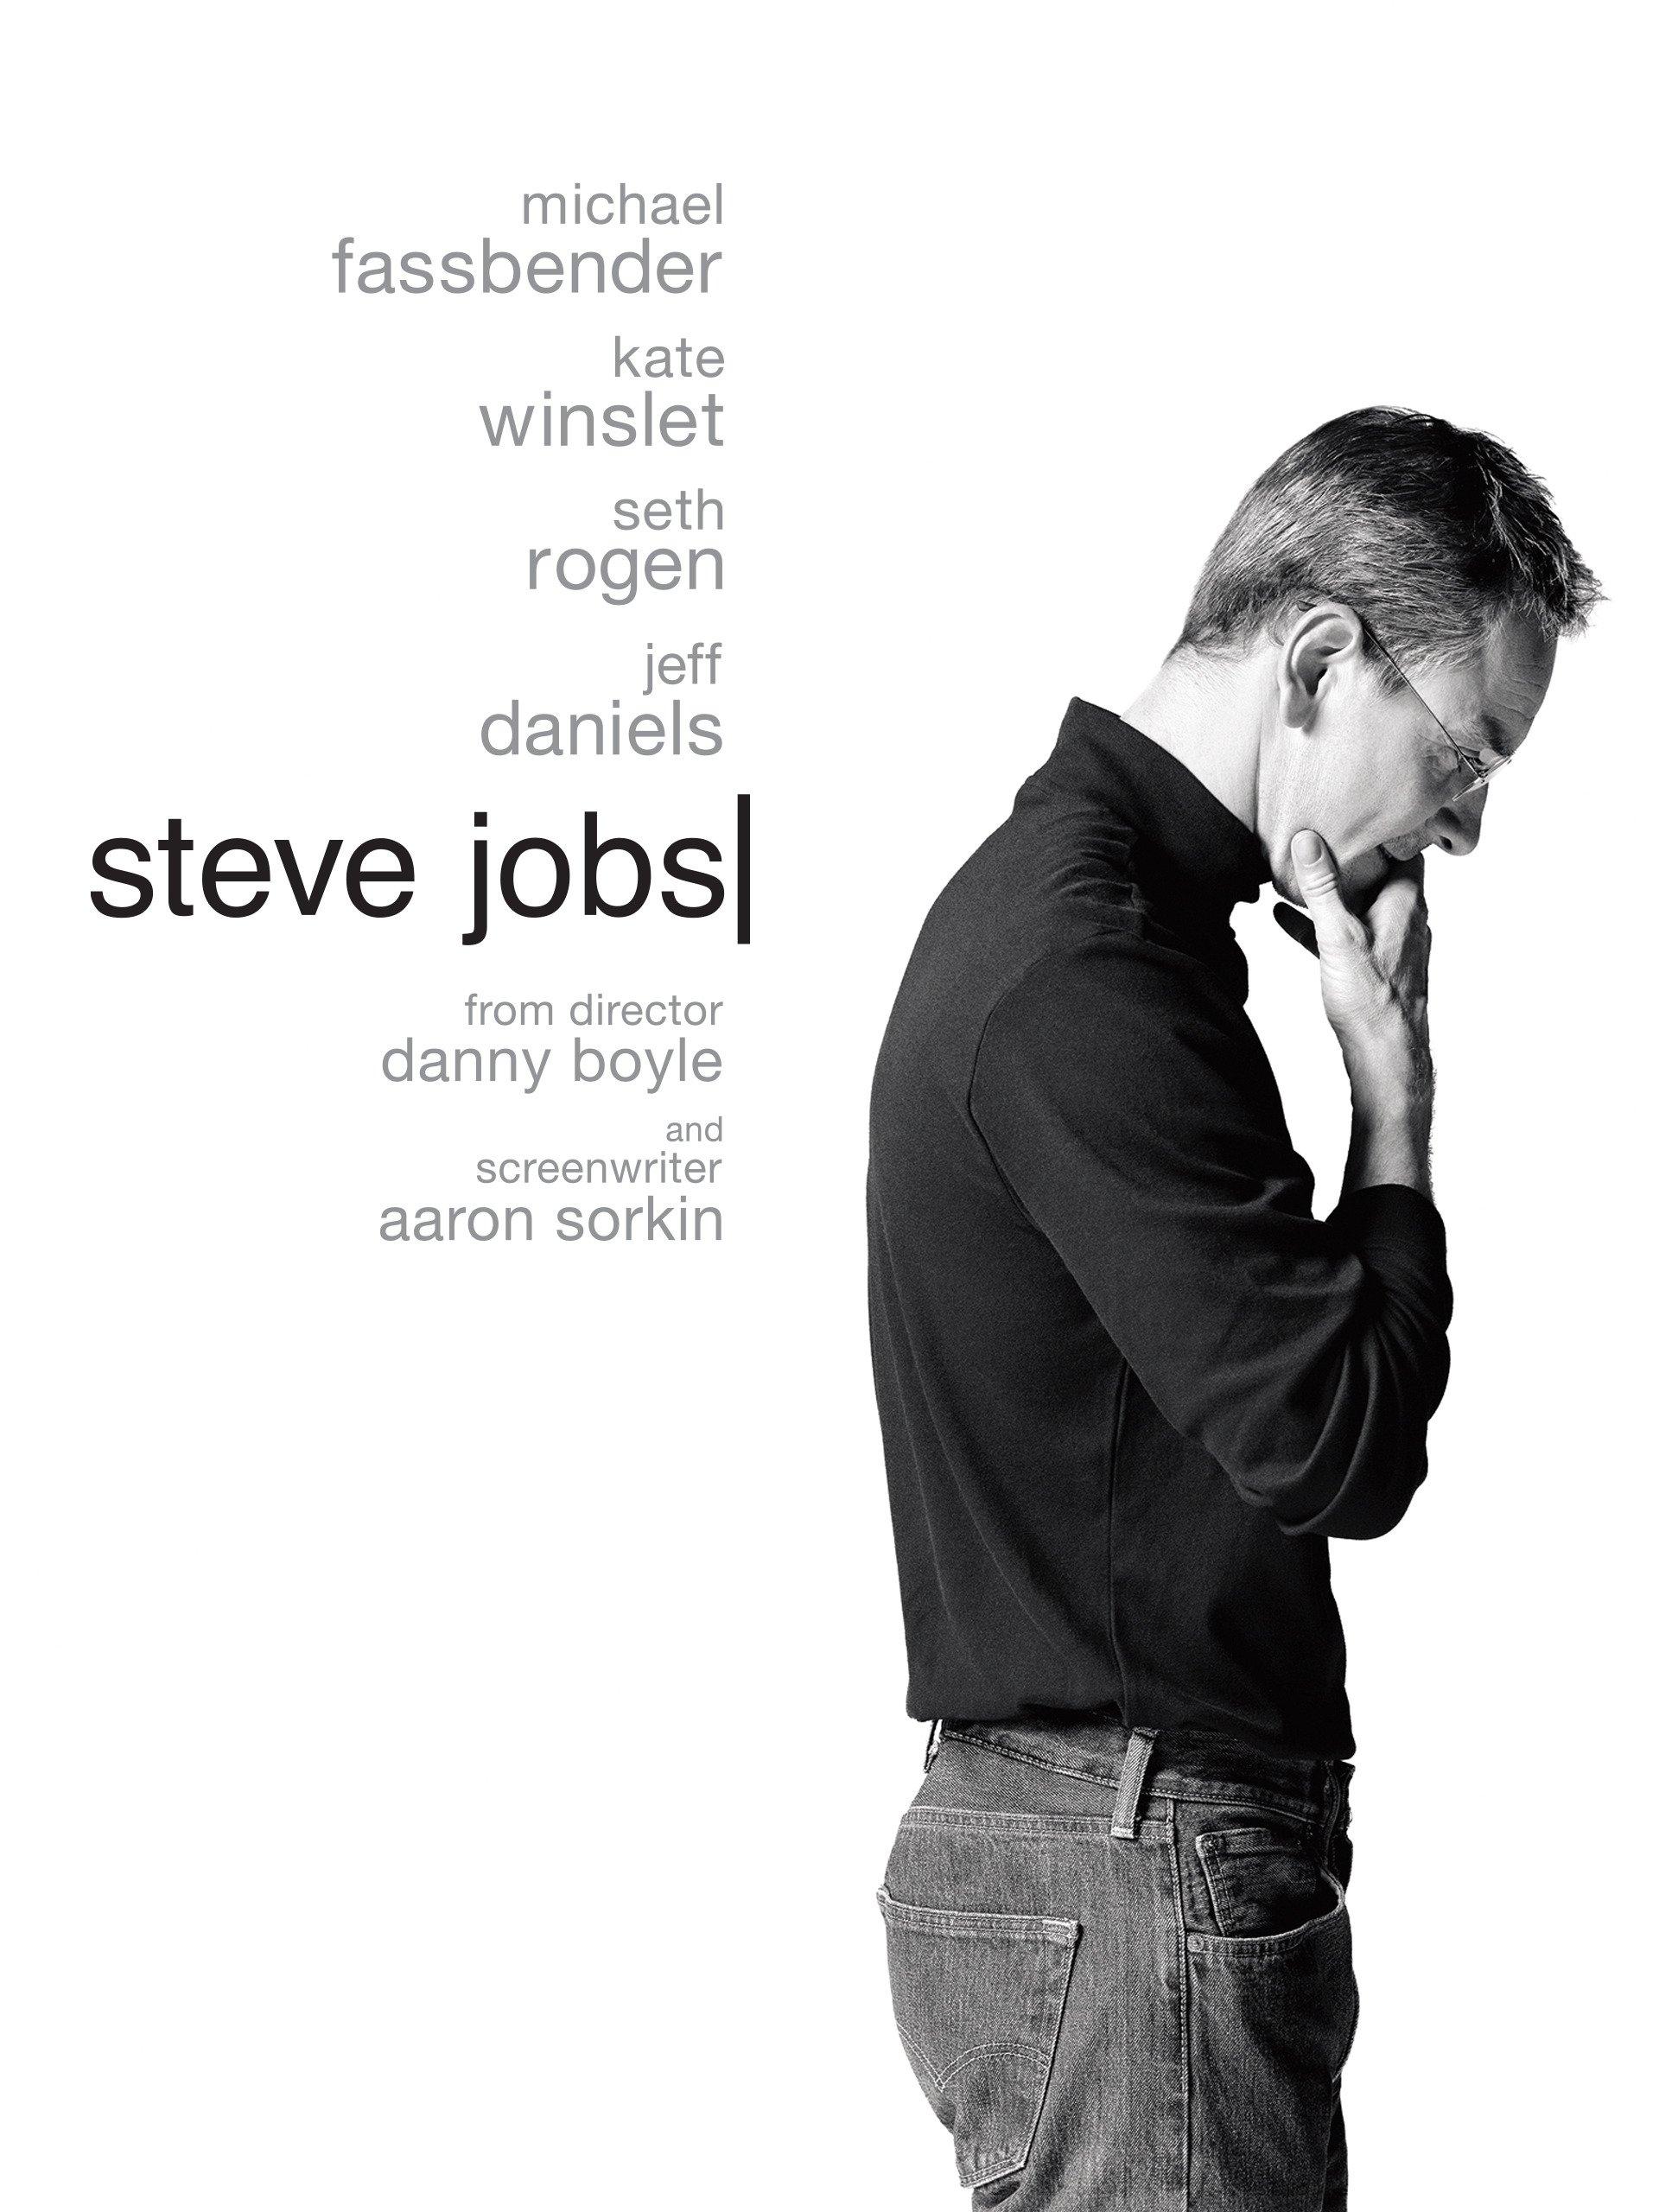 Amazon.com: Steve Jobs: Michael Fassbender, Kate Winslet, Seth Rogen ...